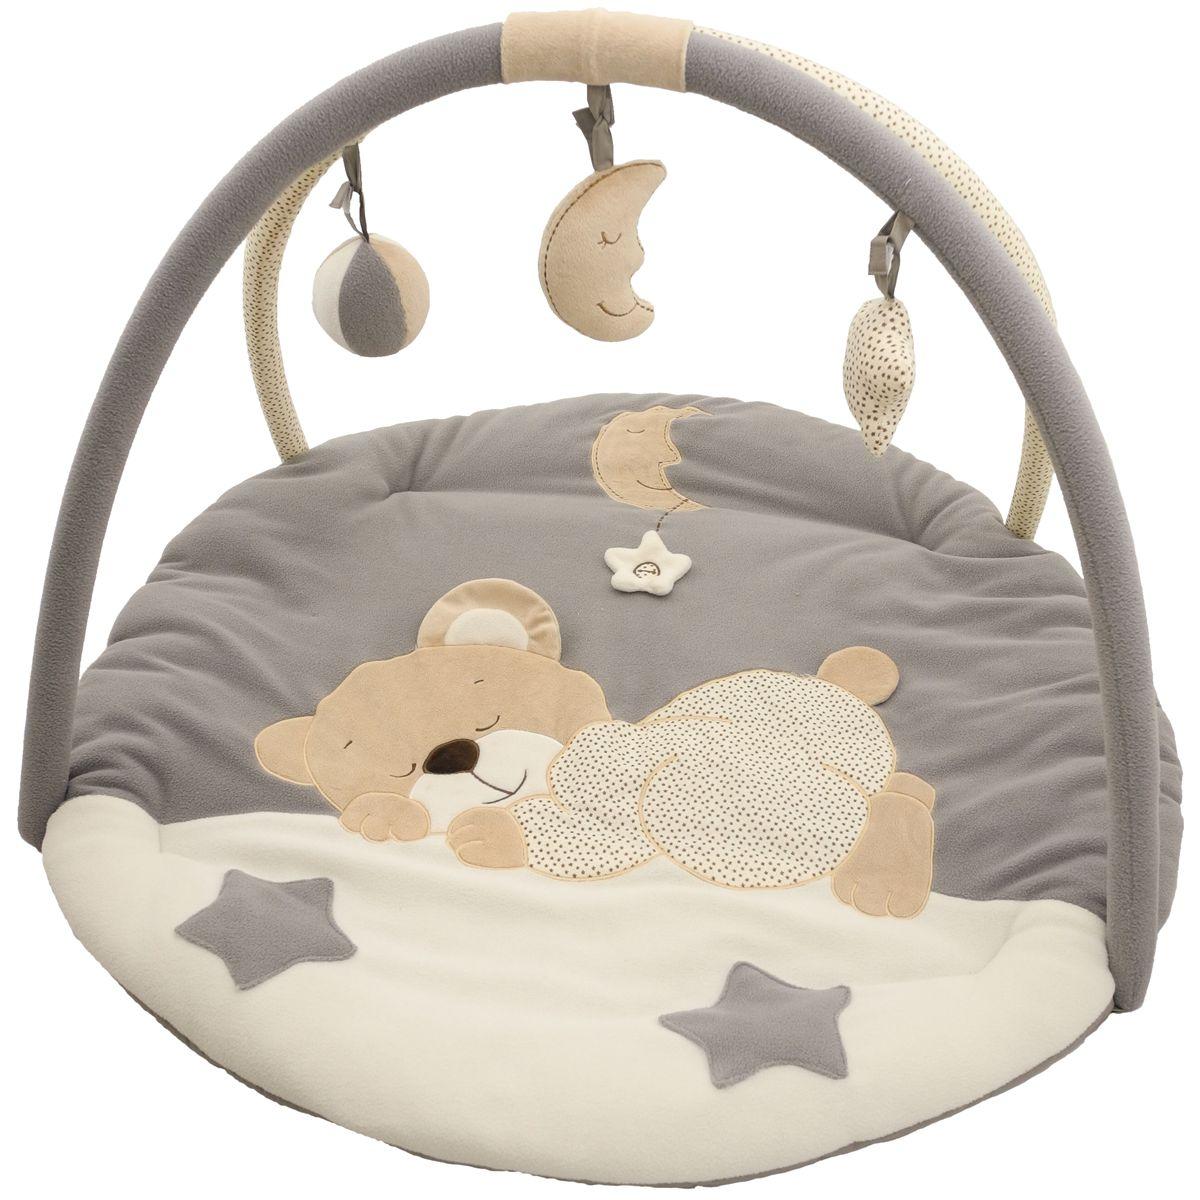 krabbeldecke erlebnisdecke spieldecke babydecke decke. Black Bedroom Furniture Sets. Home Design Ideas